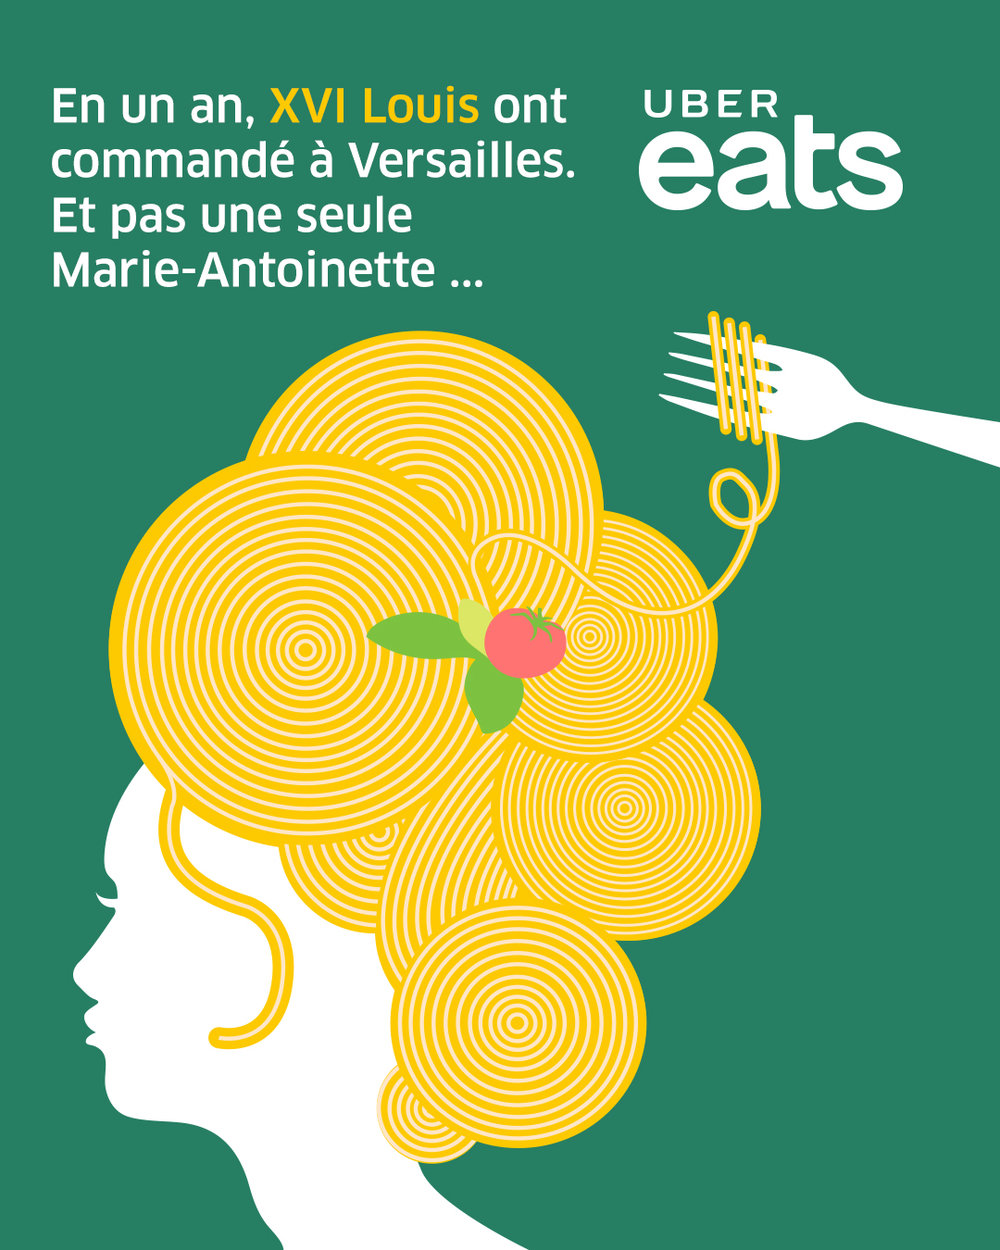 UBEREATS-1080x1350-Versailles-FR.jpg